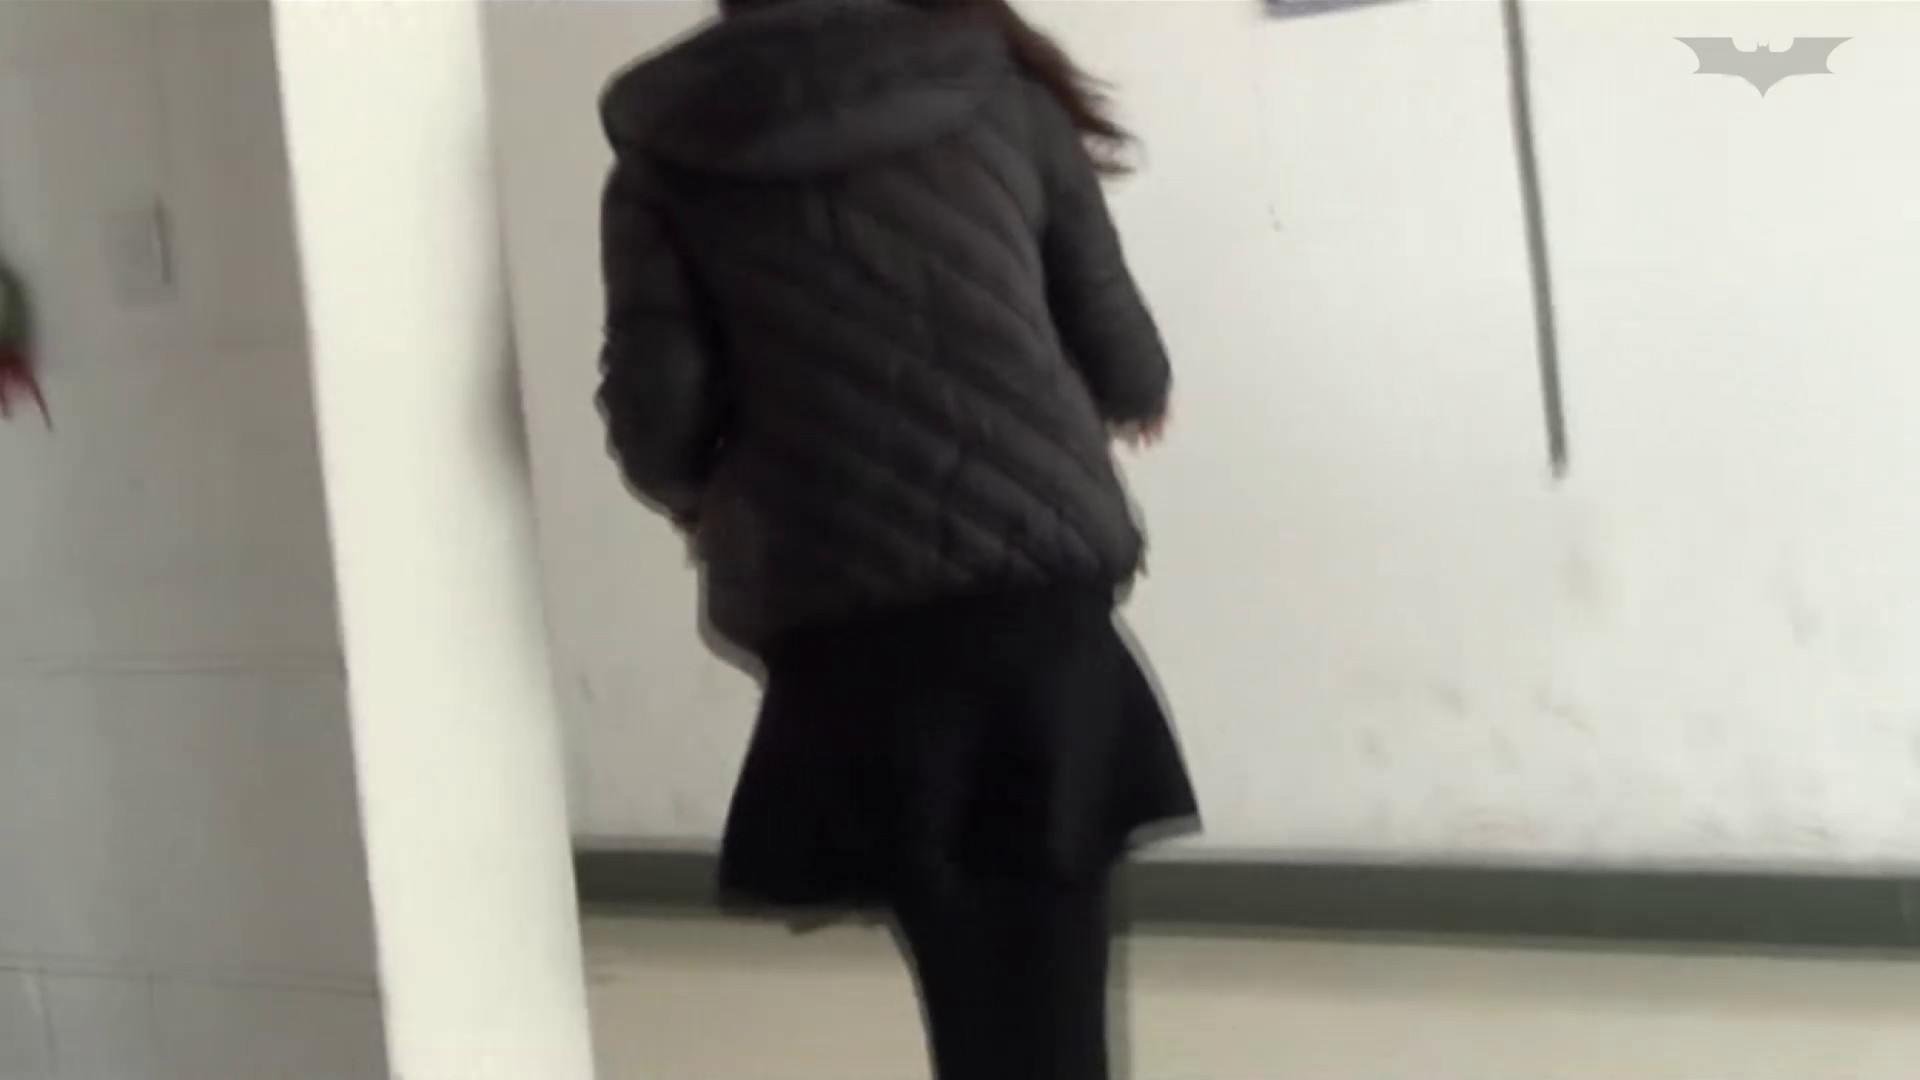 JD盗撮 美女の洗面所の秘密 Vol.46 盗撮大放出 オメコ無修正動画無料 68連発 21